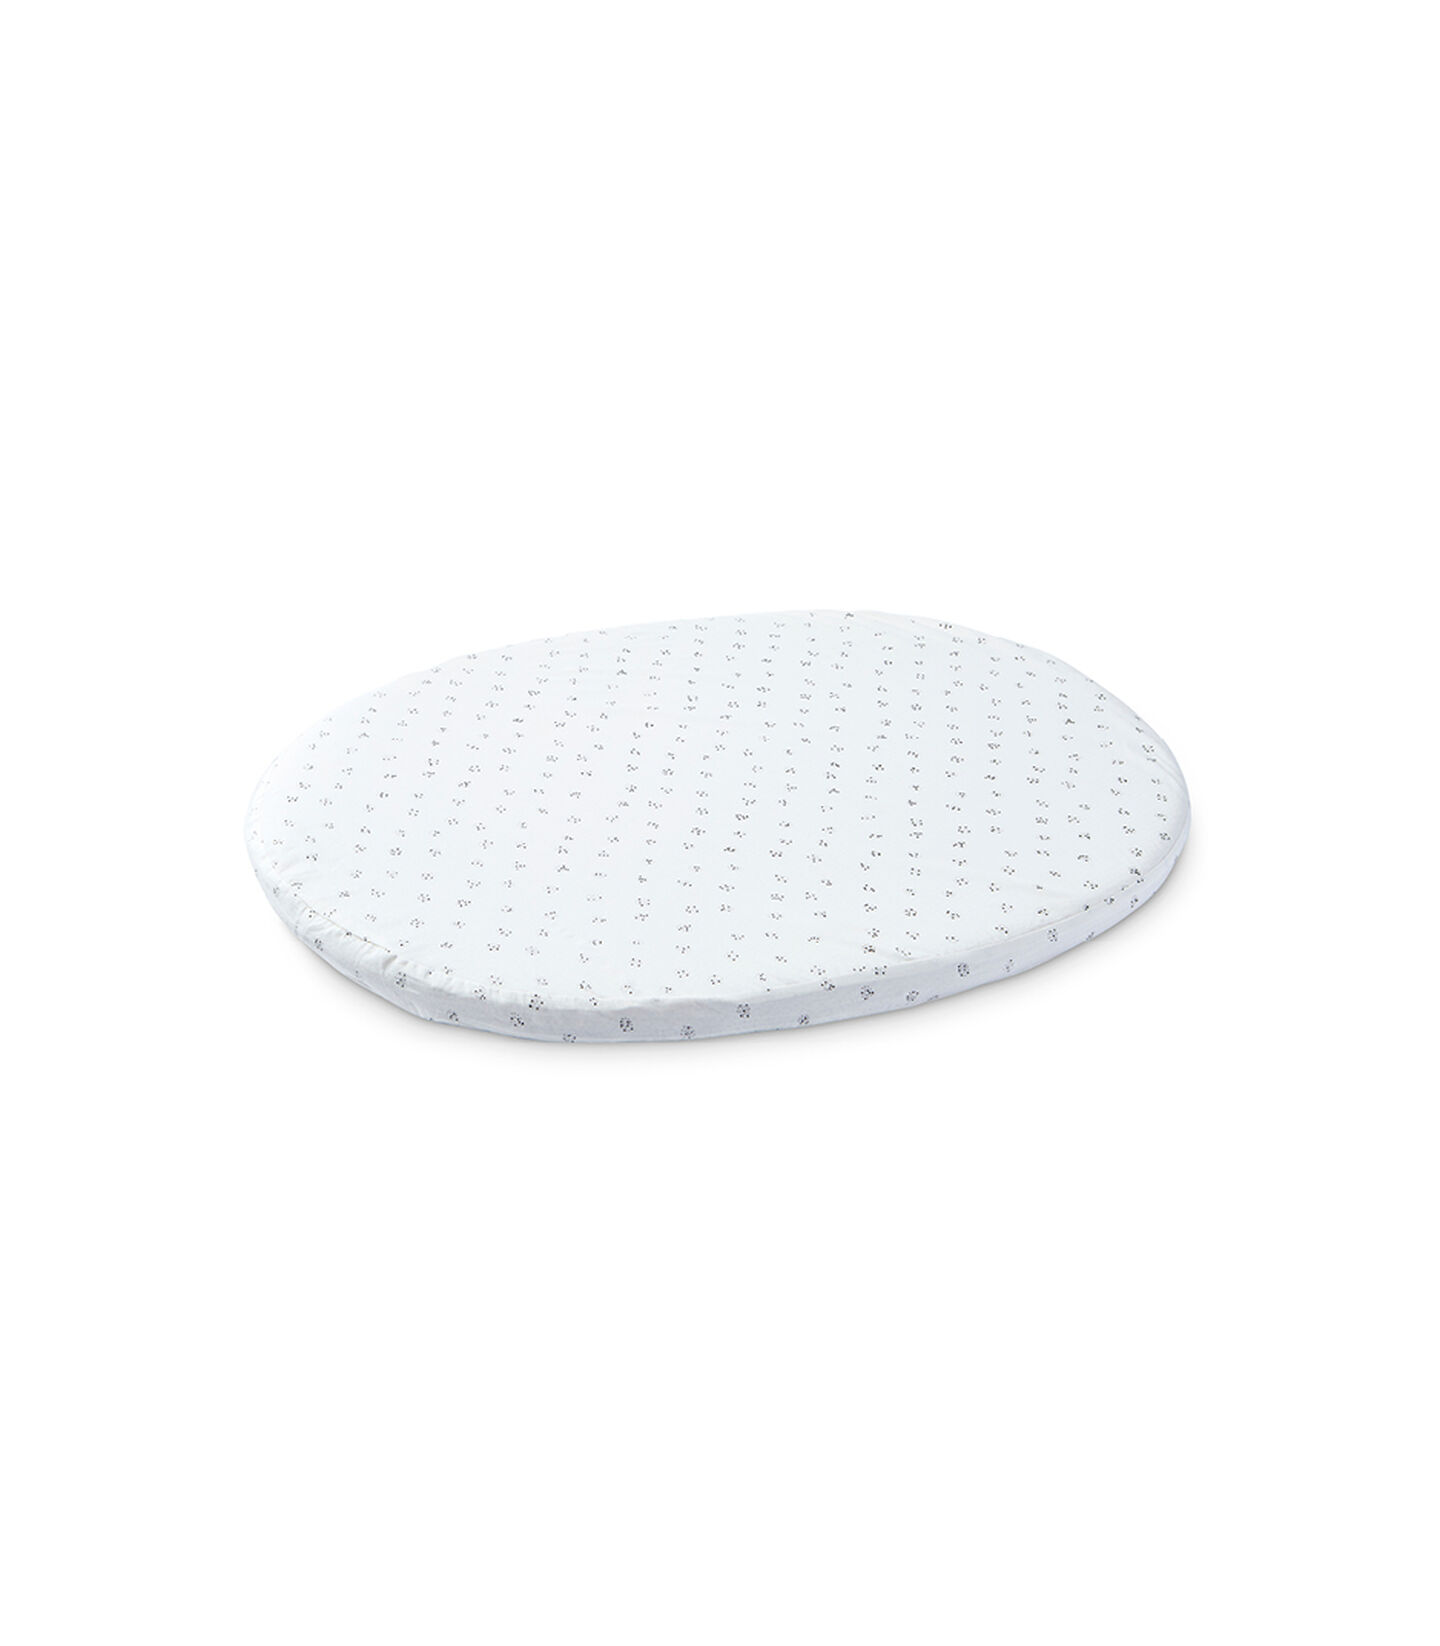 Stokke® Sleepi™ Mini Fitted Sheet Pehr Grey Dotty, Grey Dotty, mainview view 1